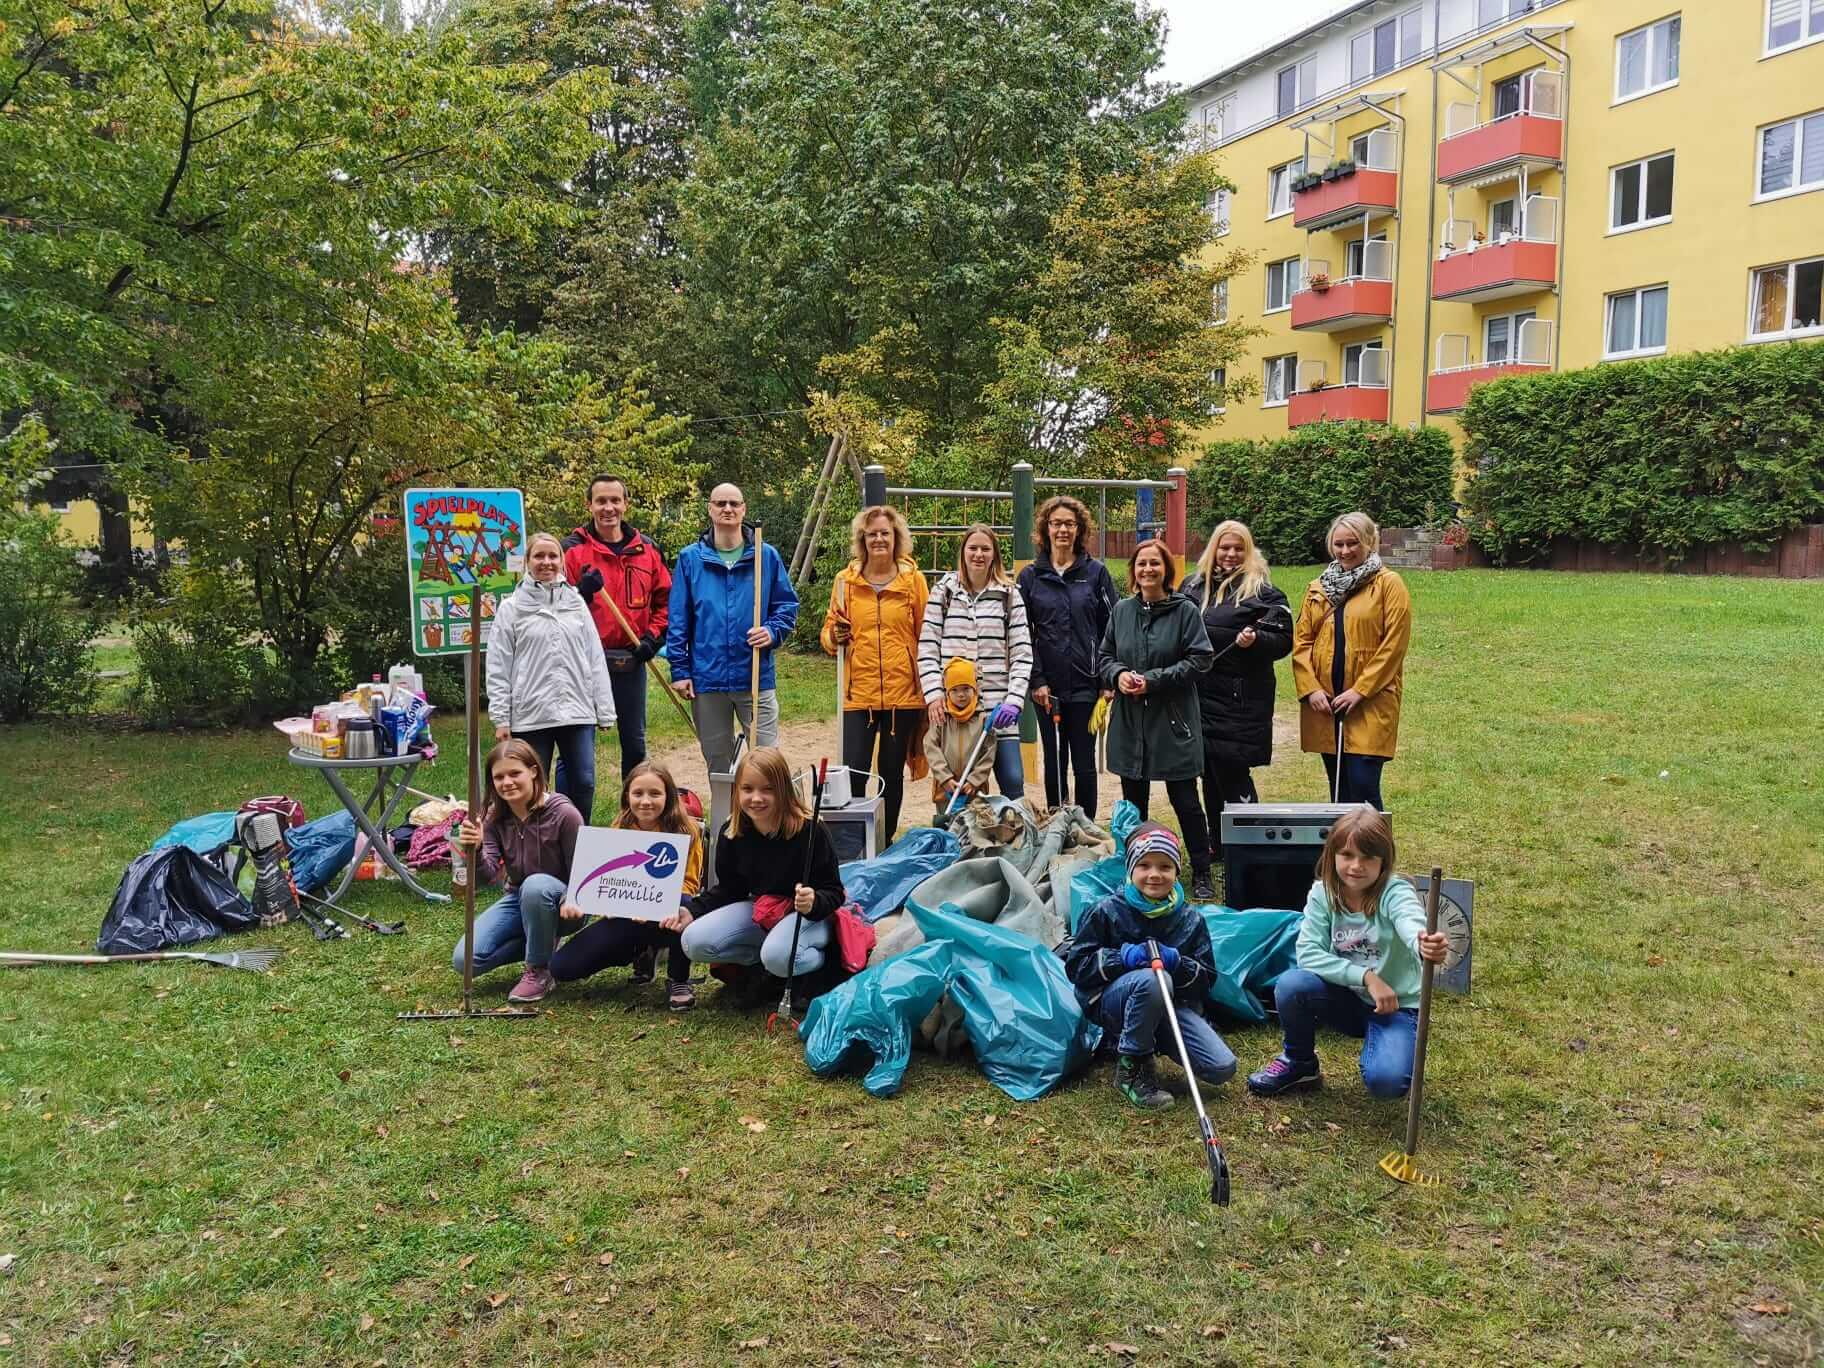 Initiative_Familie_in_LU_World_Cleanup_Day_2021